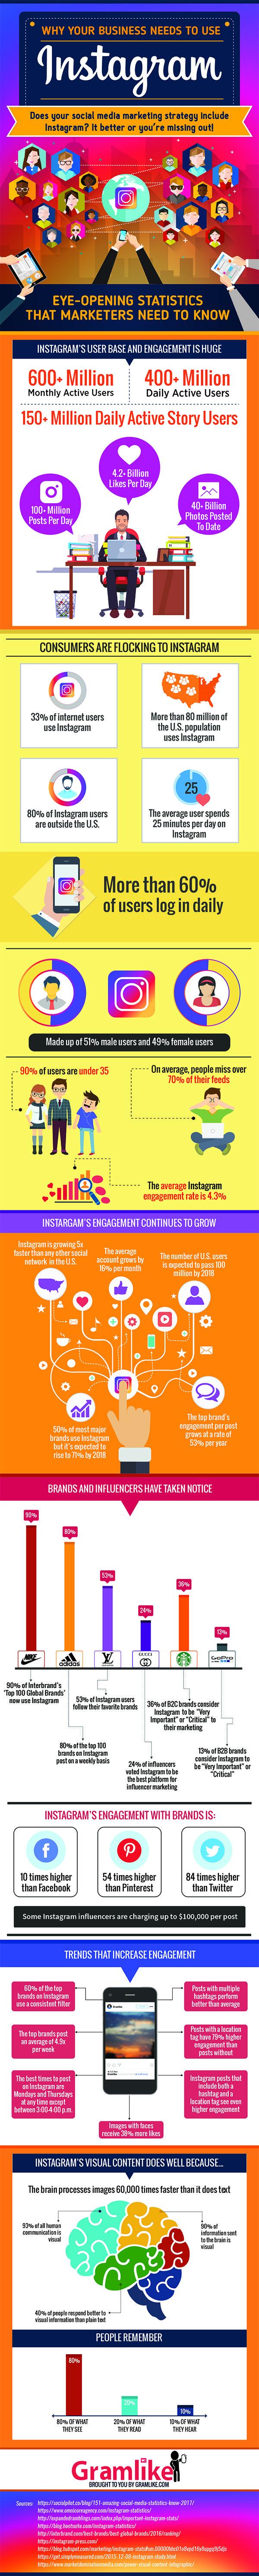 Social Media Marketing & Instagram Infographic